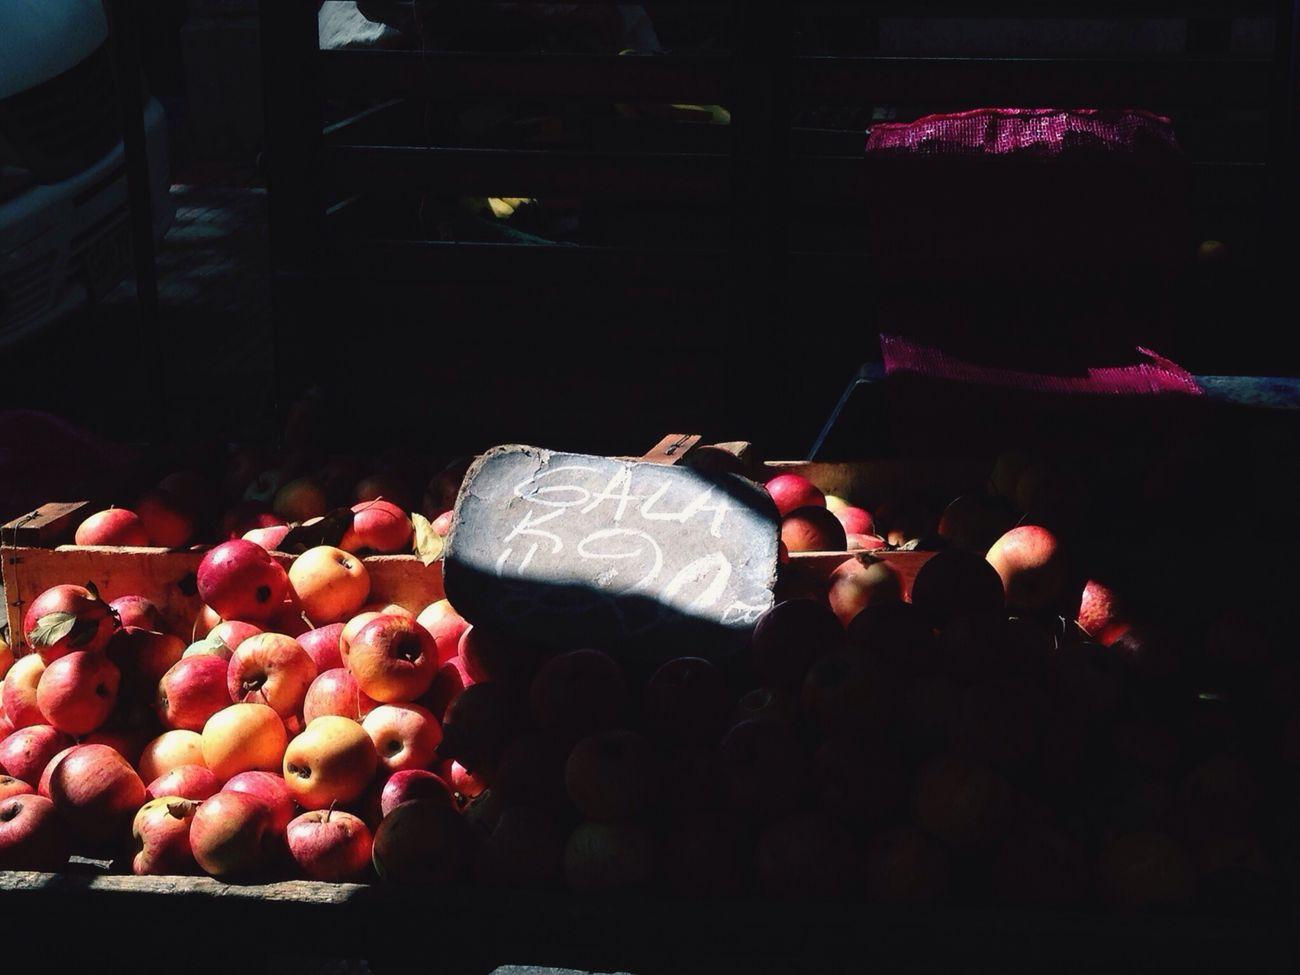 Apples Food And Drink Food Healthy Eating Close-up Manzanas